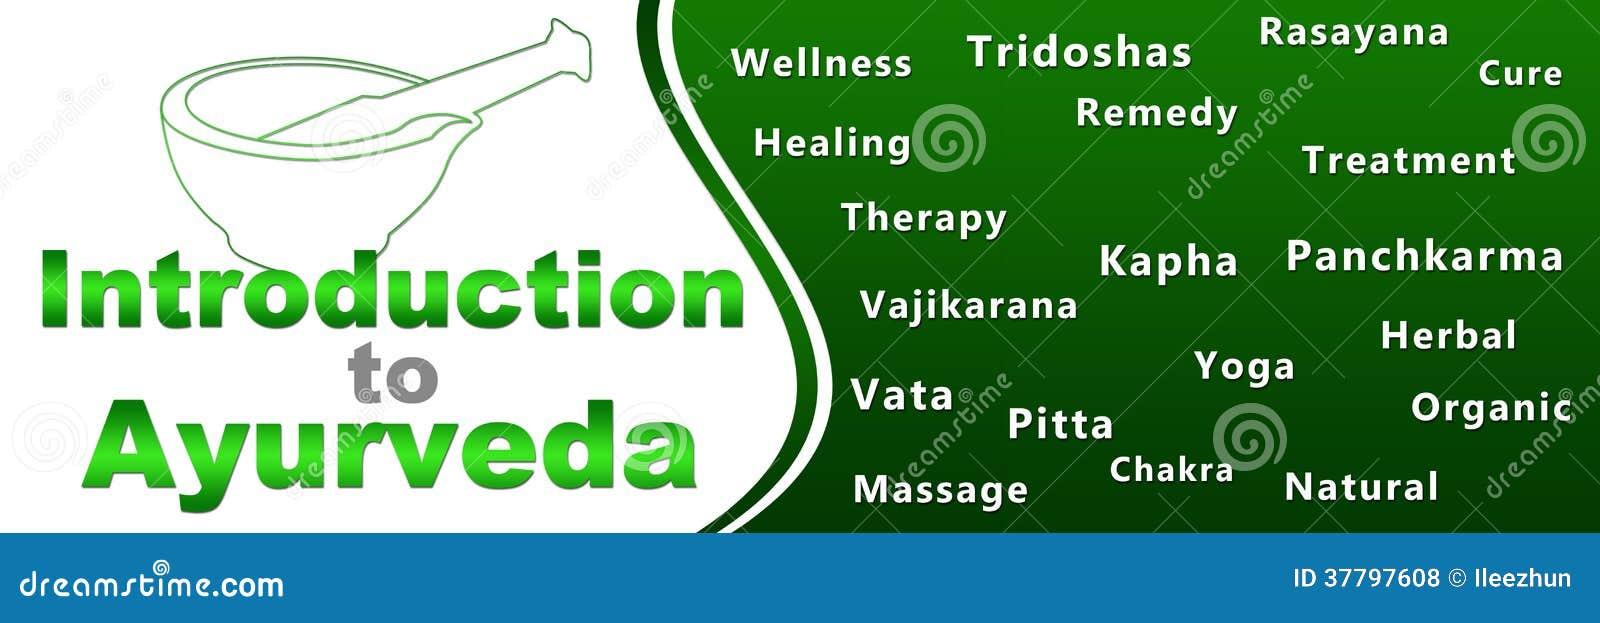 Introduction To Ayurveda Geen Keywords Banner Stock Illustration Illustration Of Image Natural 37797608